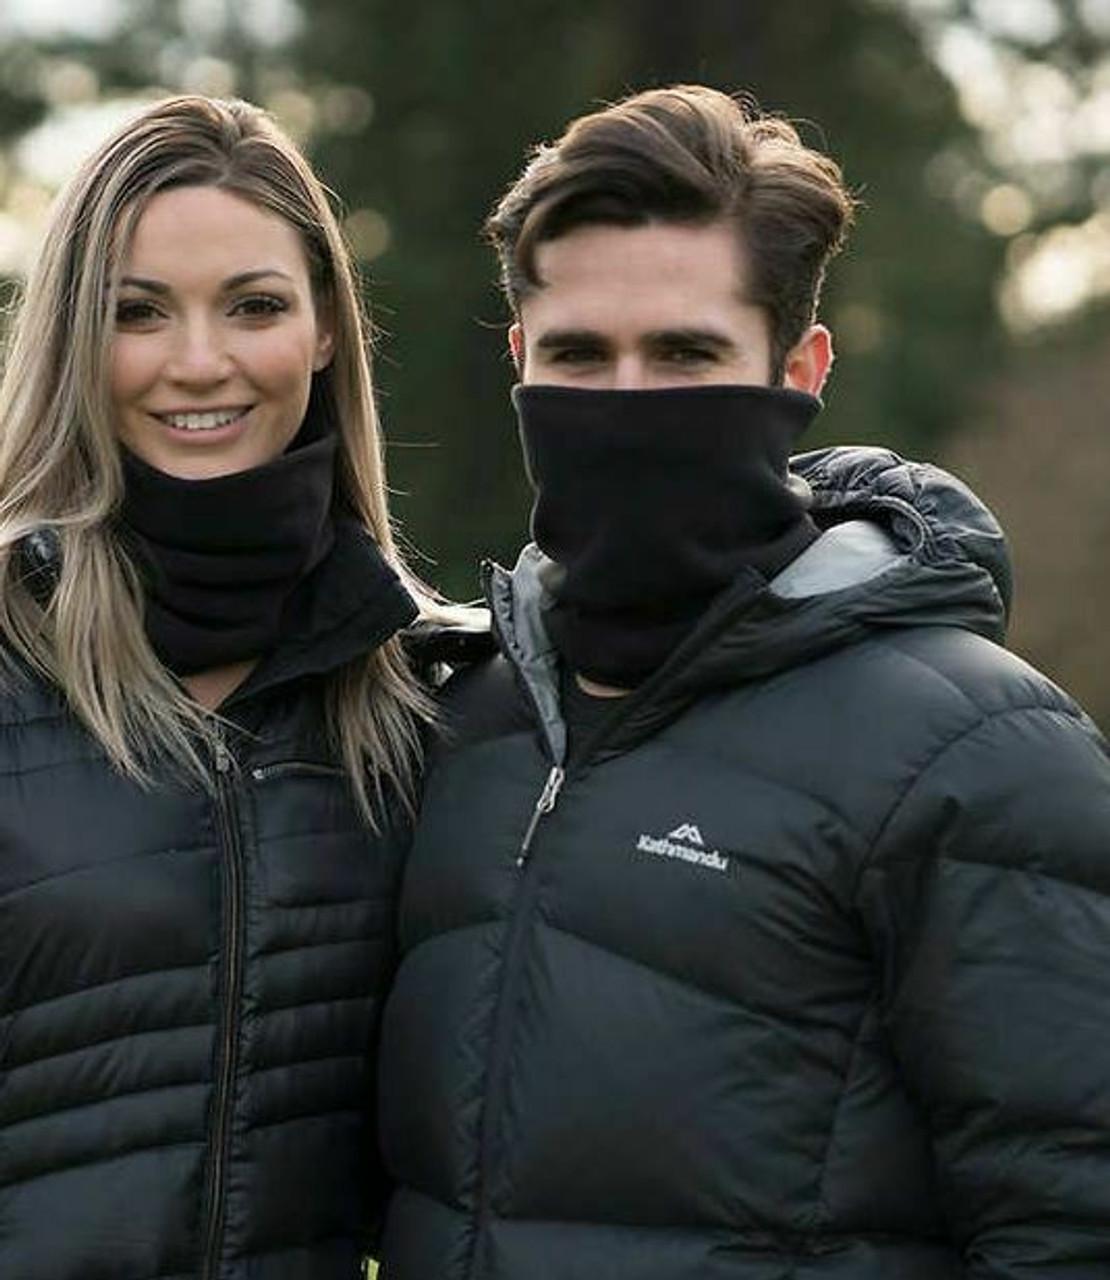 Bula Polartec Fleece Neck Warmers 2 Pack Brand New